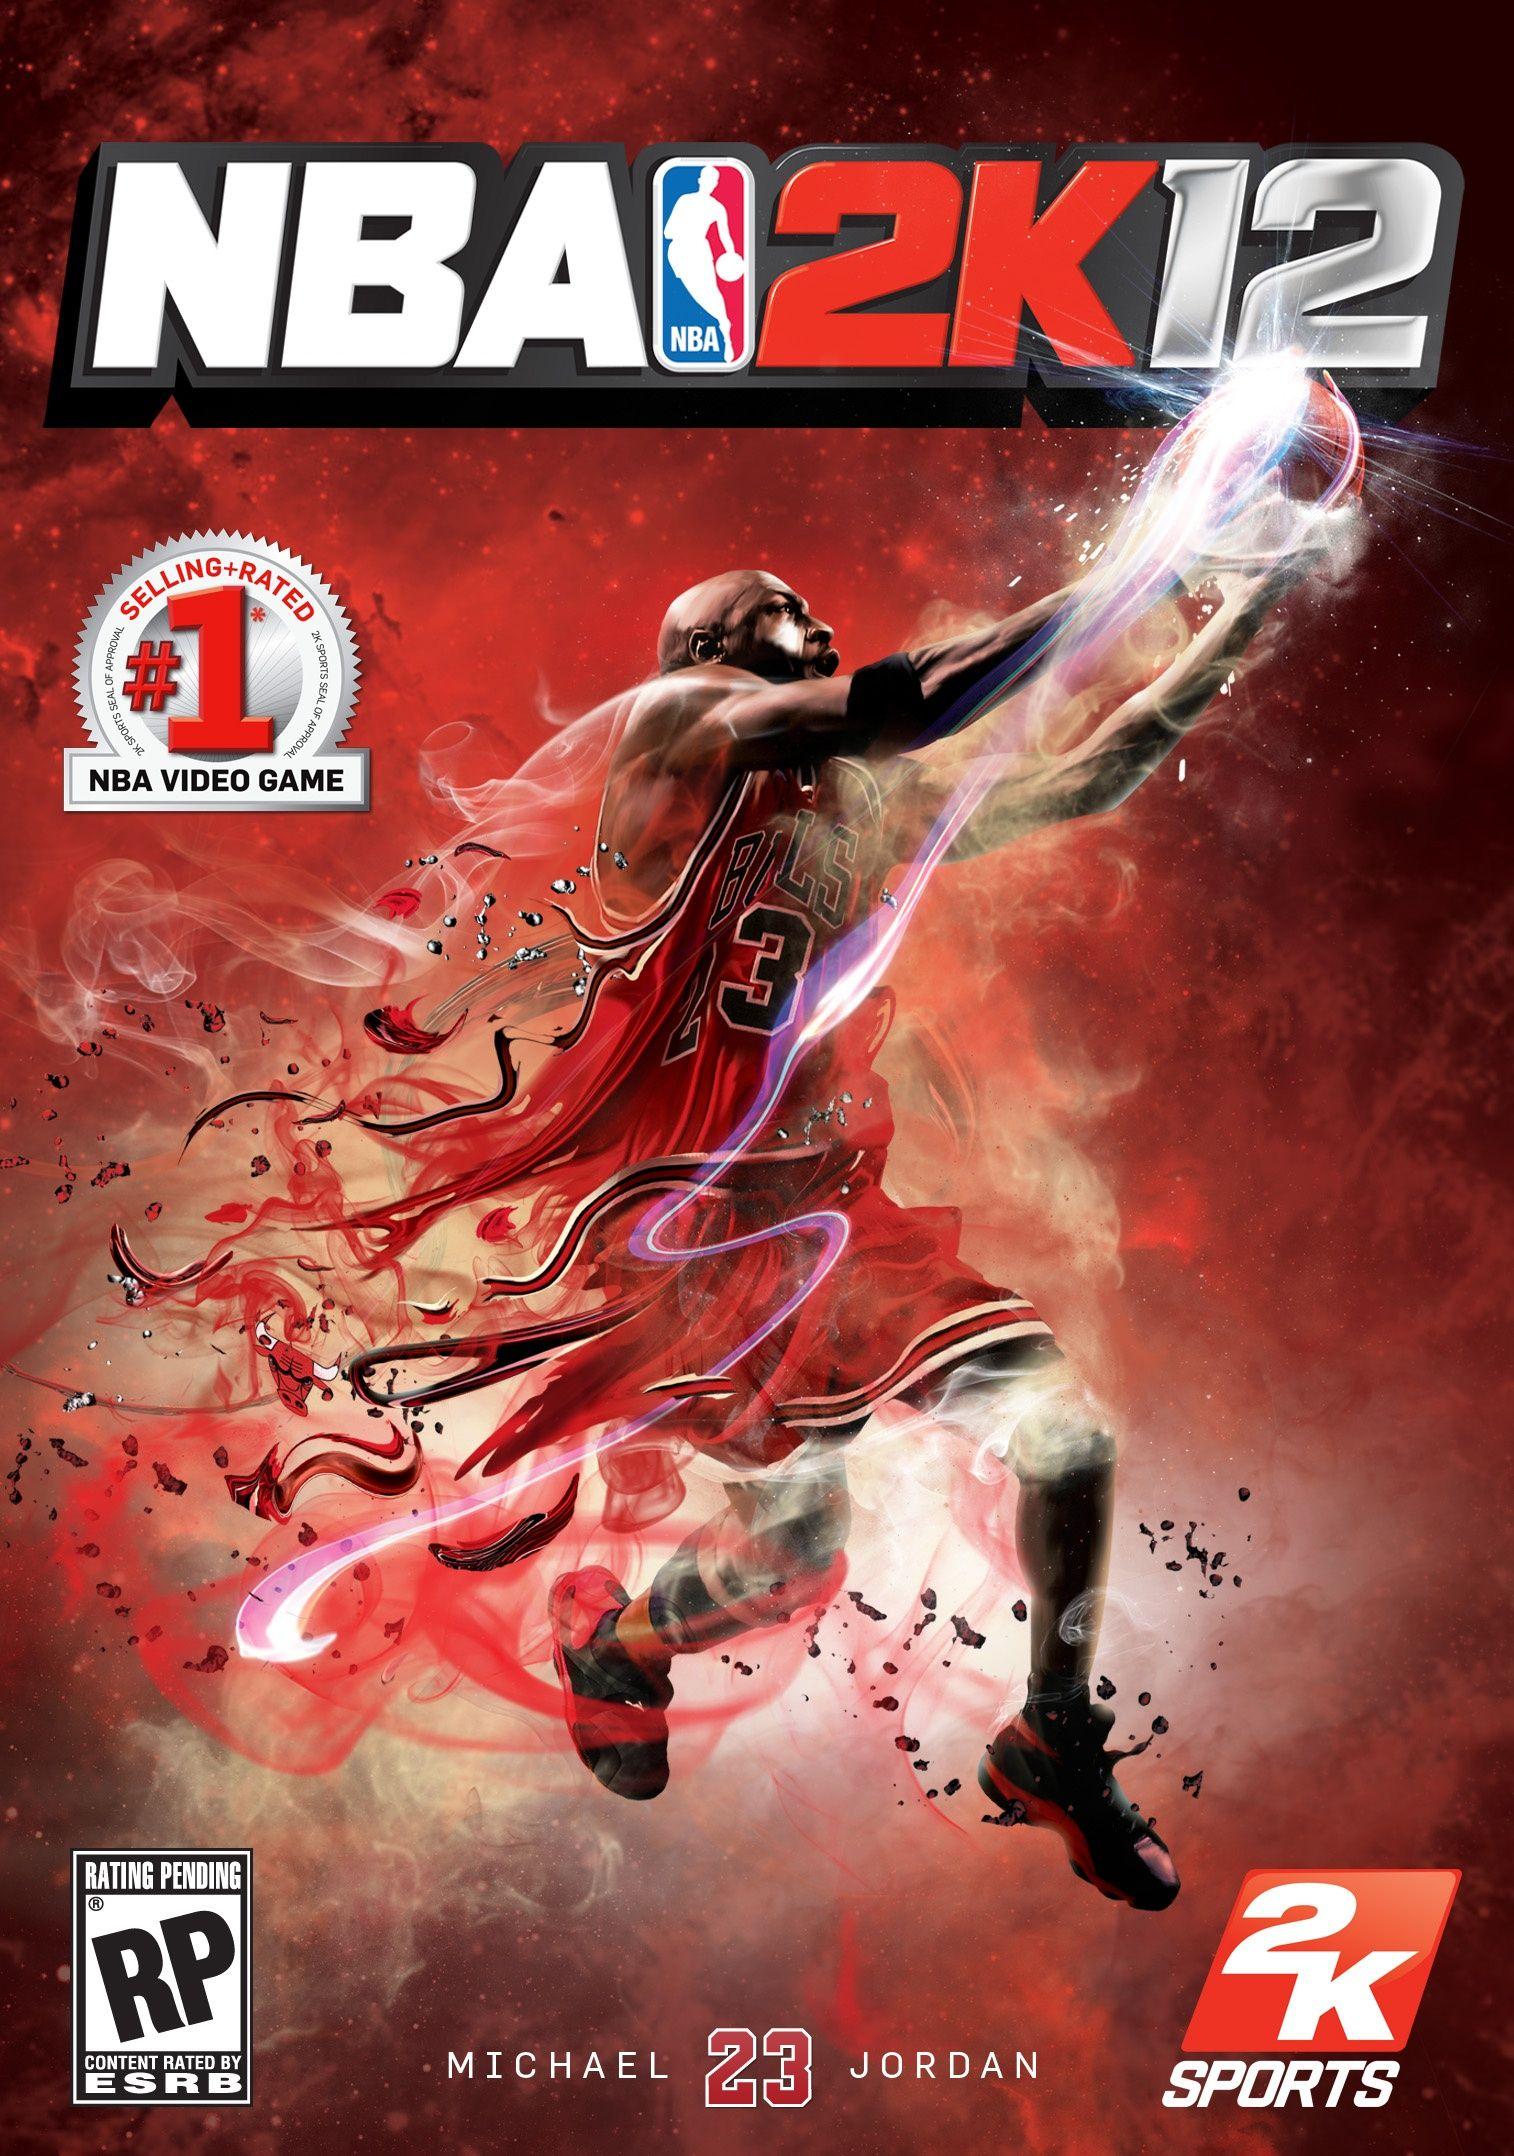 Nba 2k12 Games Pinterest Juegos Retro Consolas And Videojuegos